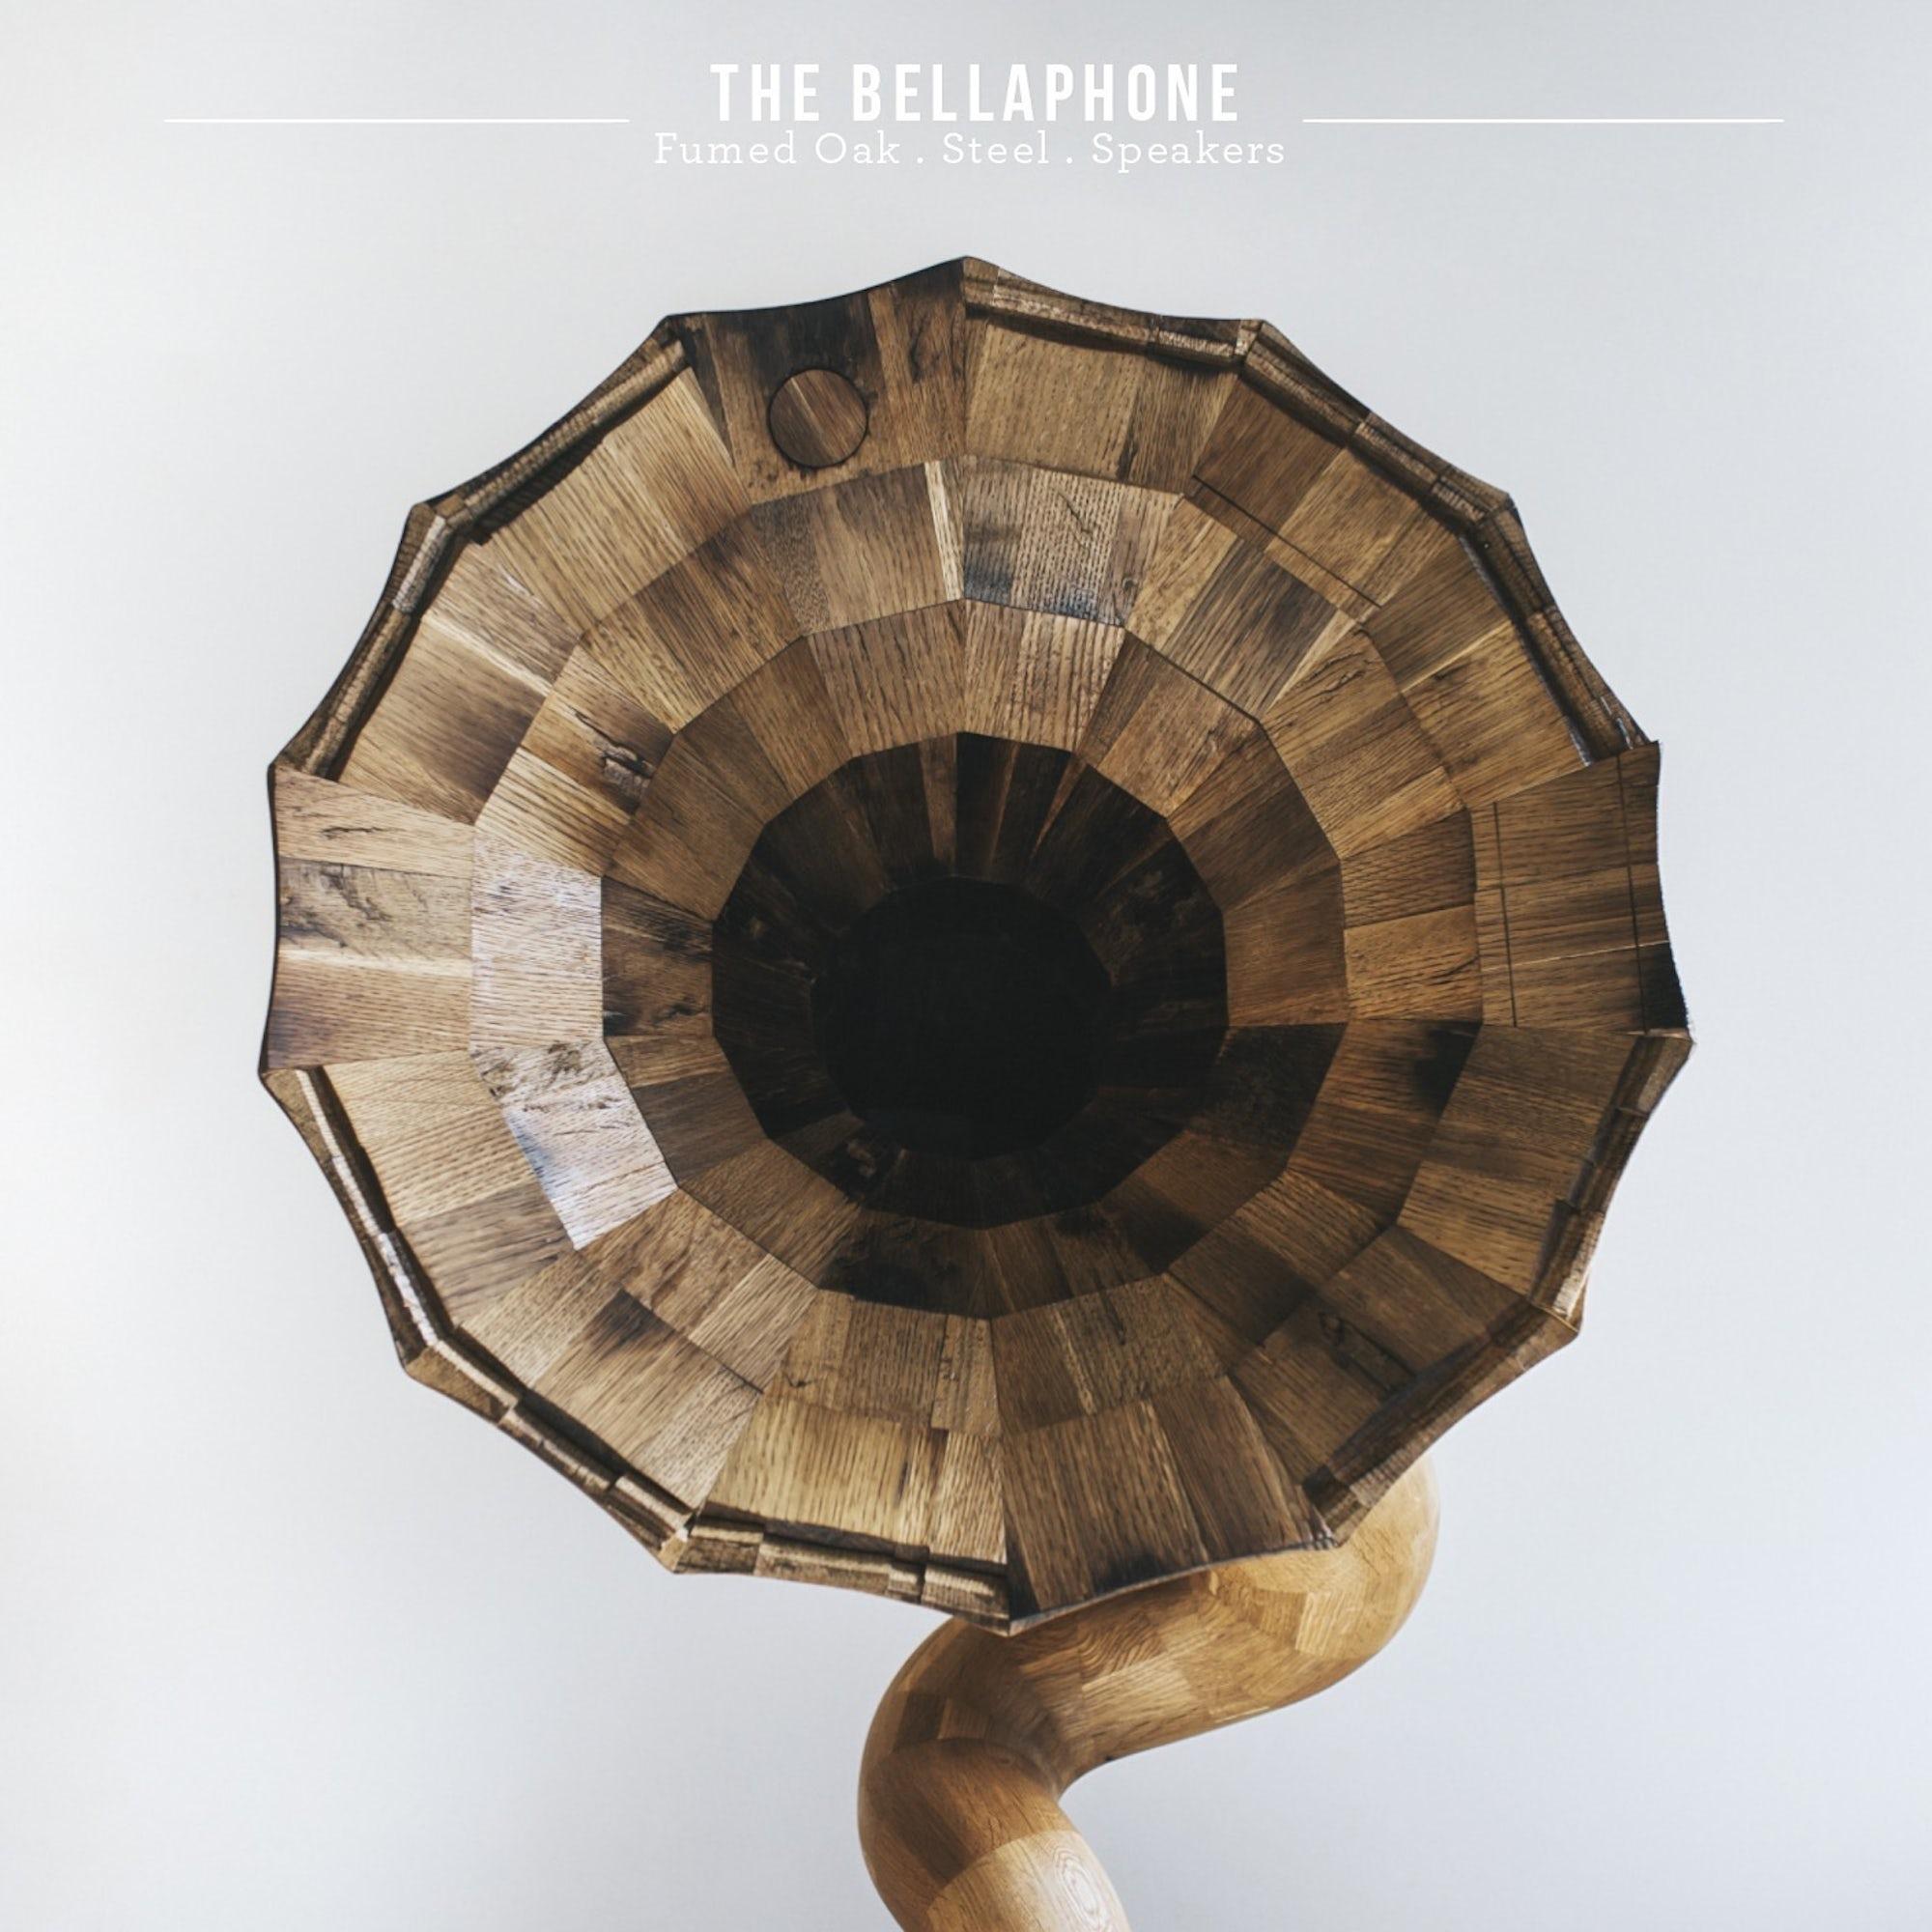 BELLAPHONE